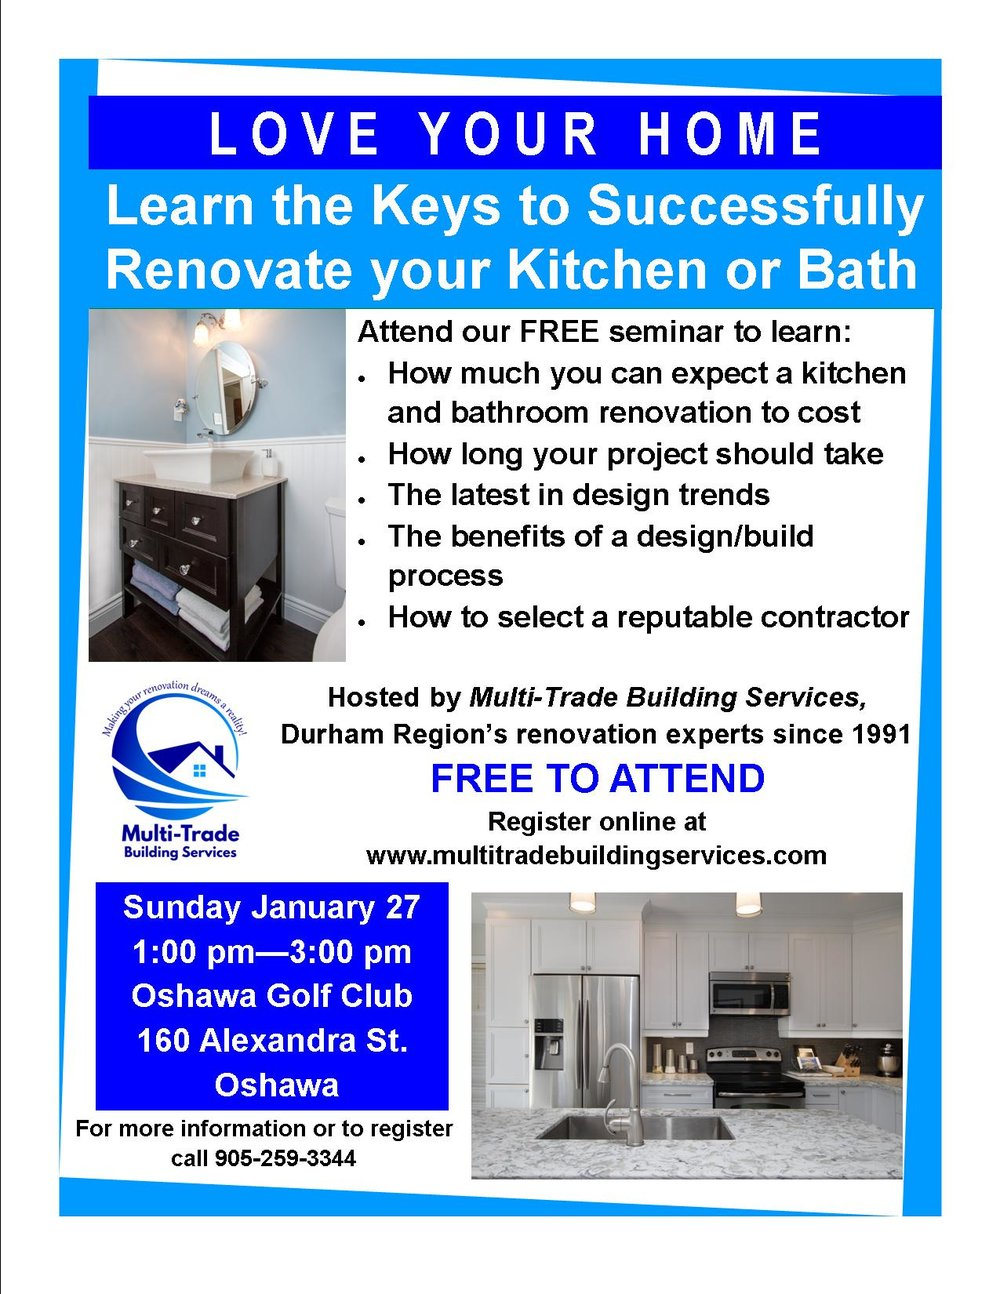 love your home seminar jan 27.jpg